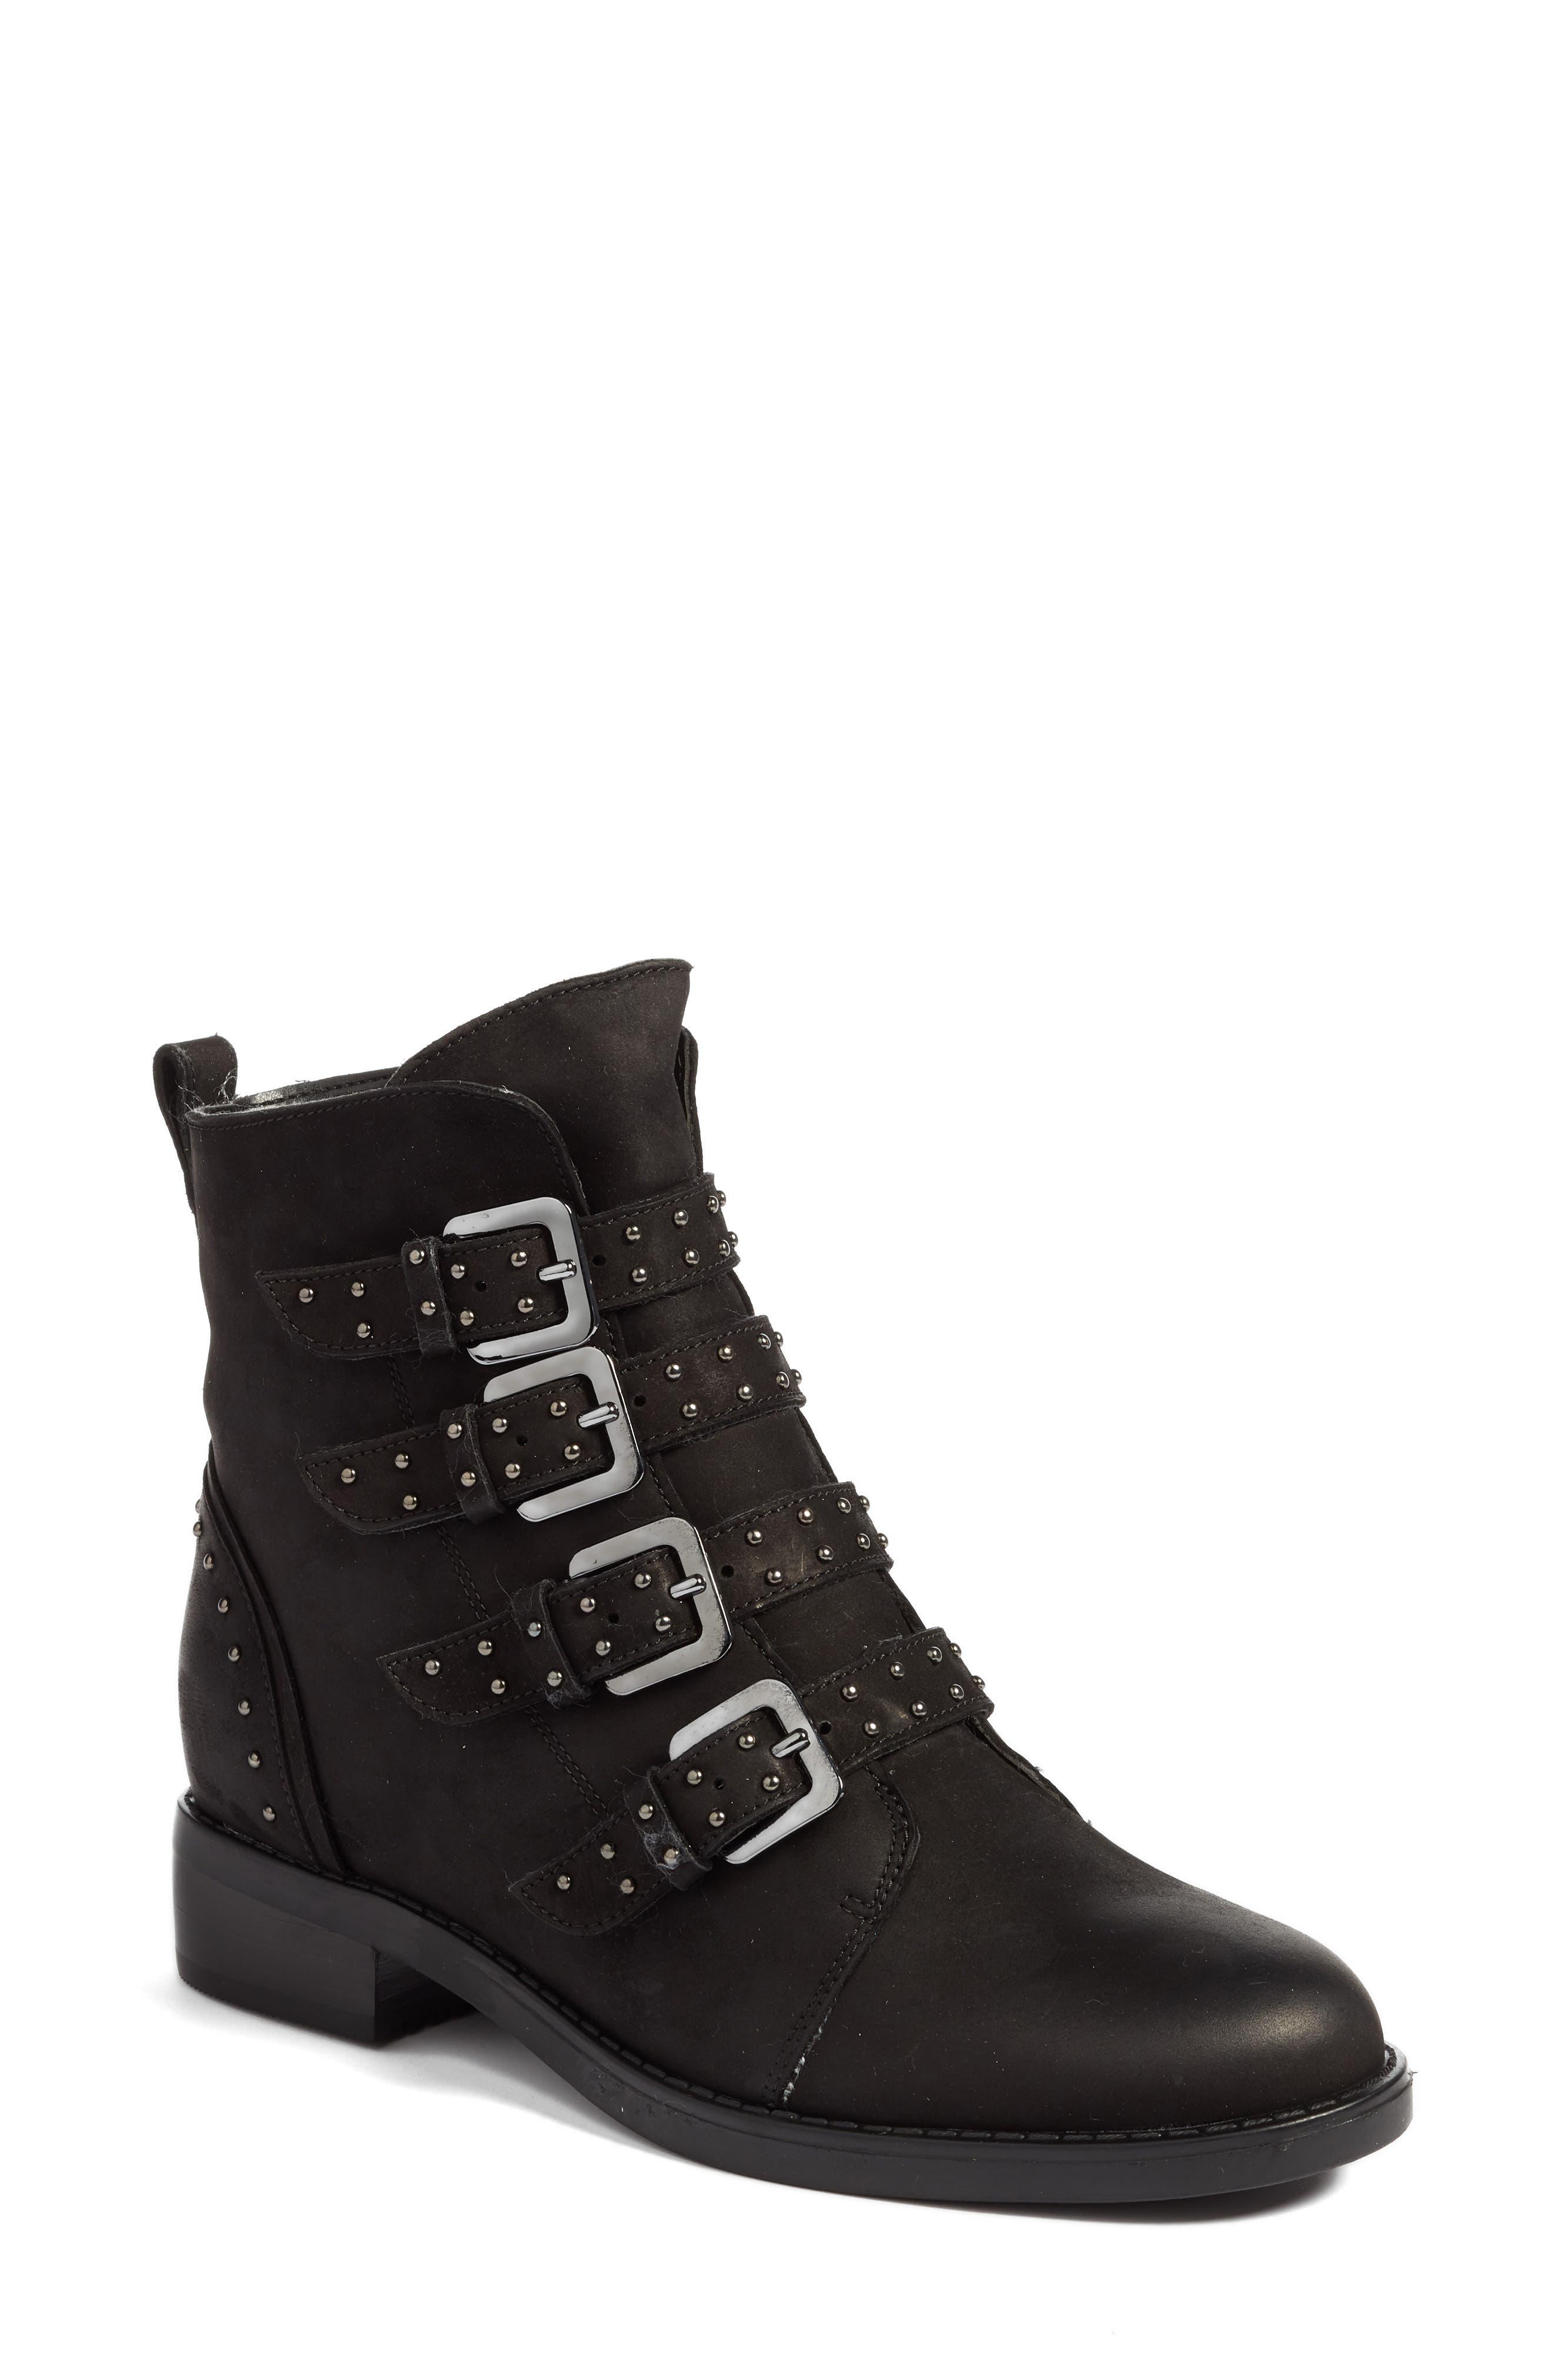 Blondo Elani Waterproof Moto Boot- Black